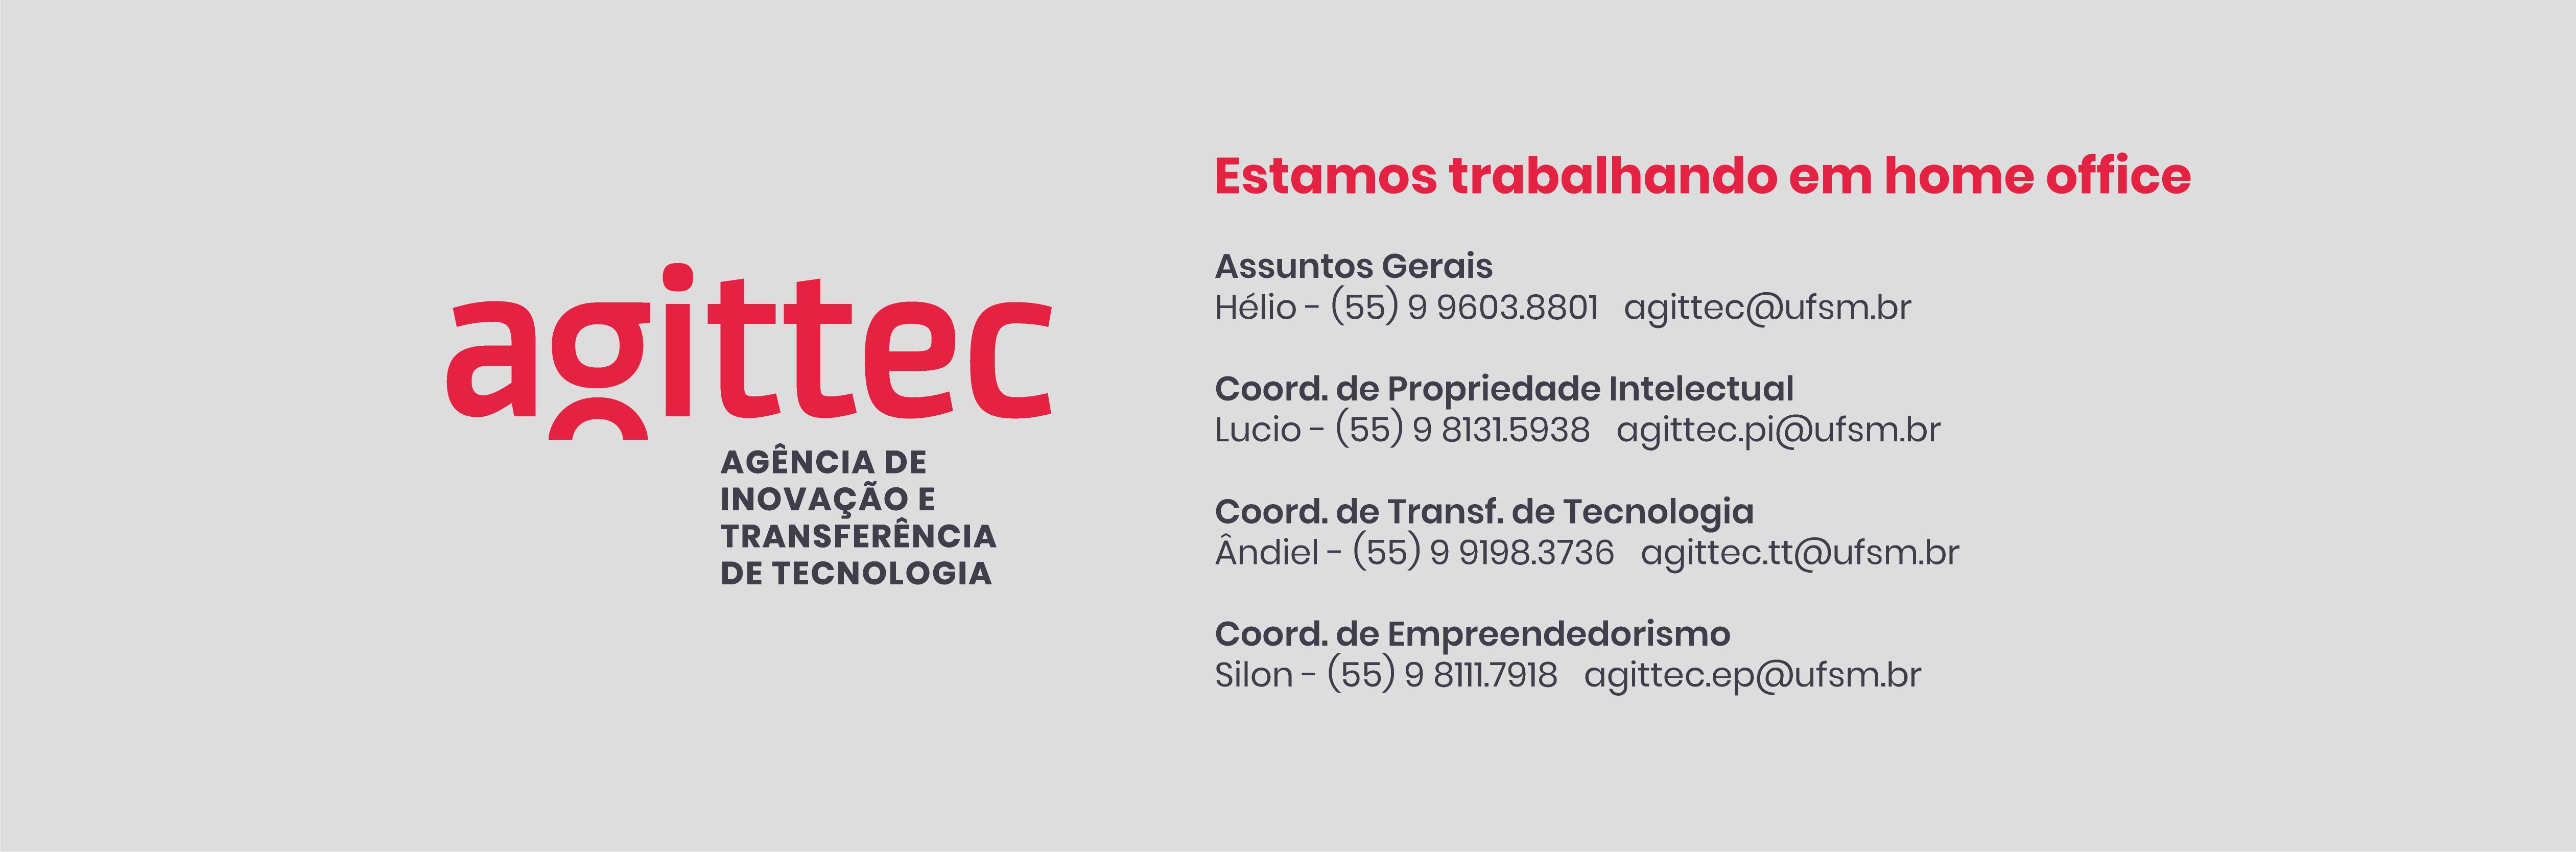 Estamos trabalhando em home office: Assuntos Gerais - Hélio | (55) 9 9603.8801 | agittec@ufsm.br; Coord. de Propriedade Intelectual - Lucio | (55) 9 8131.5938 | agittec.pi@ufsm.br; Coord. de Transf. de Tecnologia - Ândiel | (55) 9 9198.3736 | agittec.tt@ufsm.br; Coord. de Empreendedorismo - Silon | (55) 9 8111.7918 | agittec.ep@ufsm.br